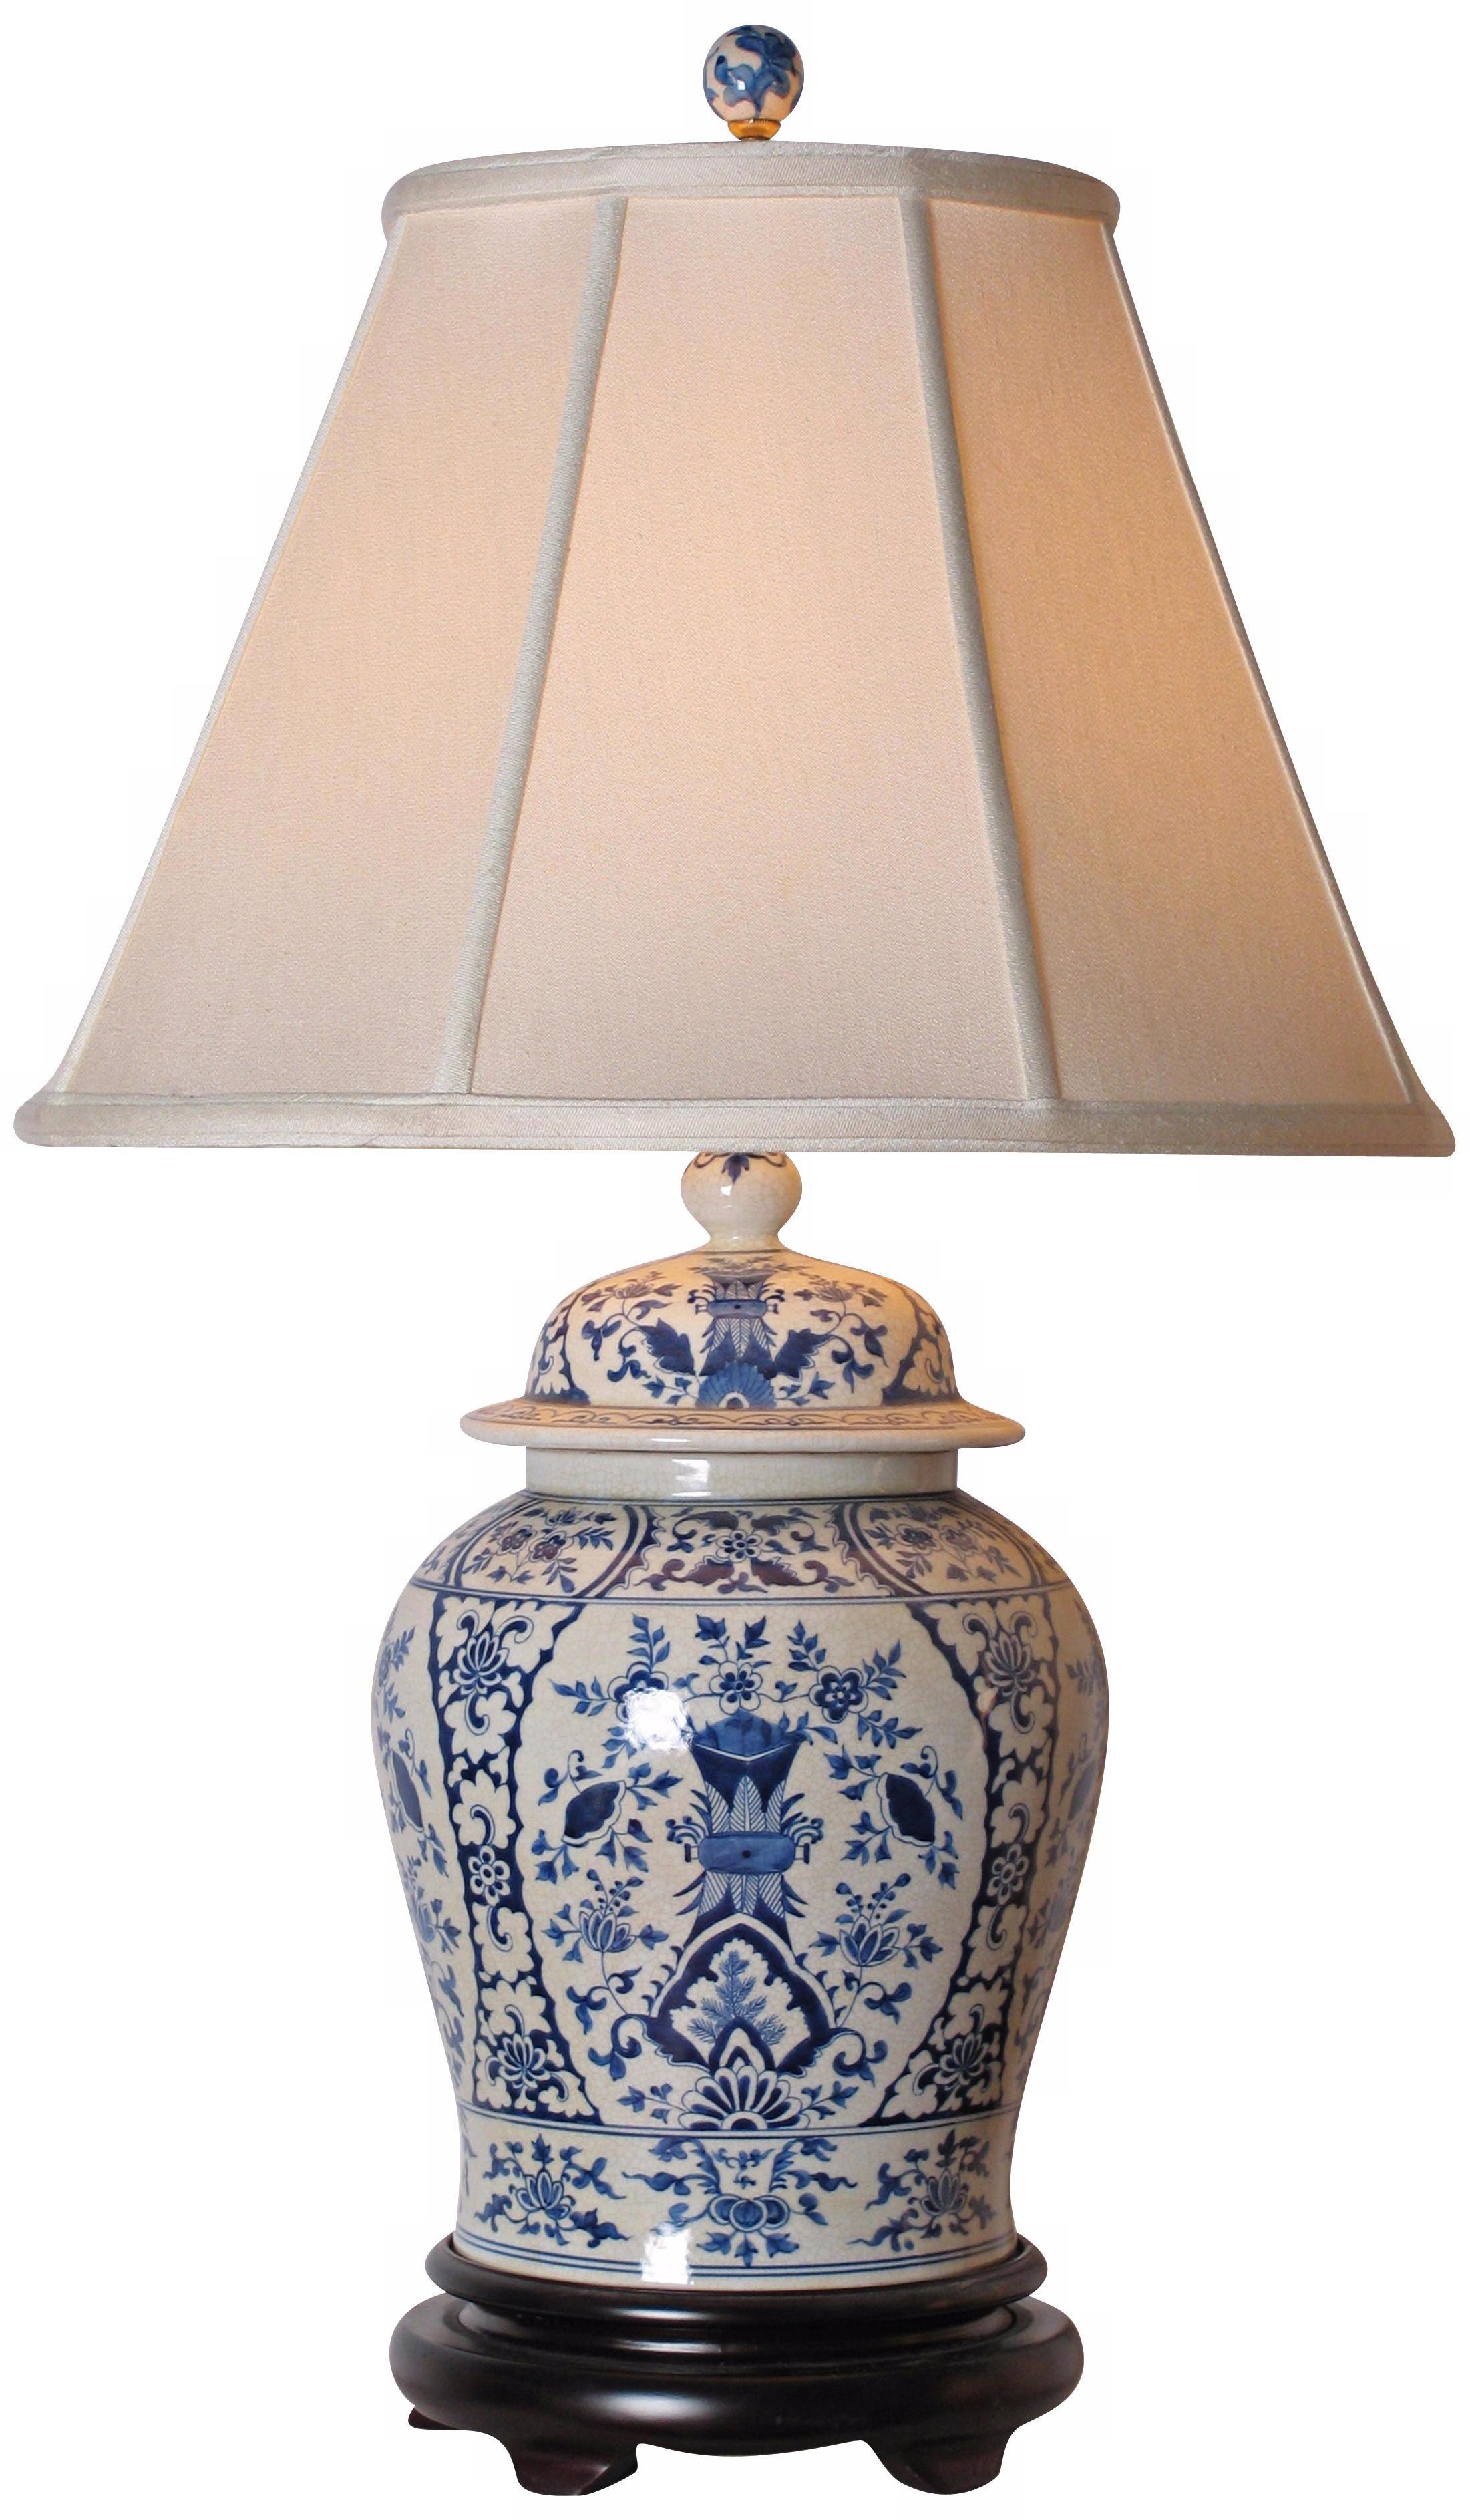 English Blue And White Porcelain Temple Jar Table Lamp G7064 Lamps Plus In 2021 Jar Table Lamp Lamp Lamp Decor